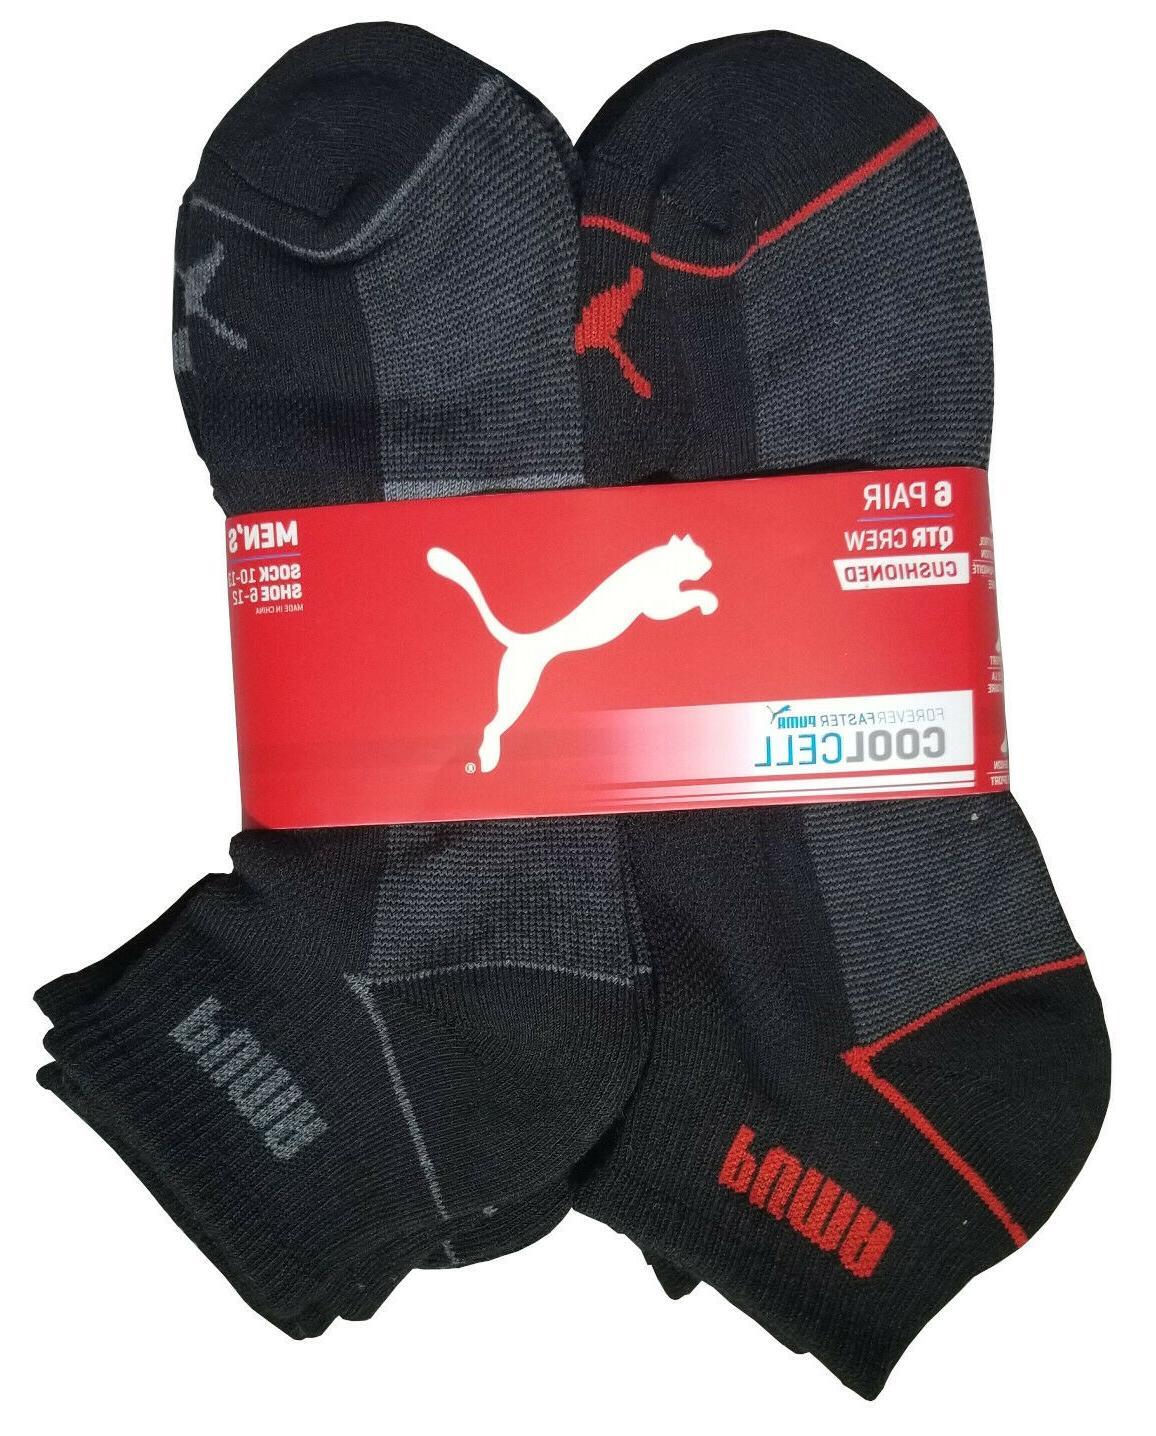 mens quarter puma socks 6 pairs socks size 10-13 6-12